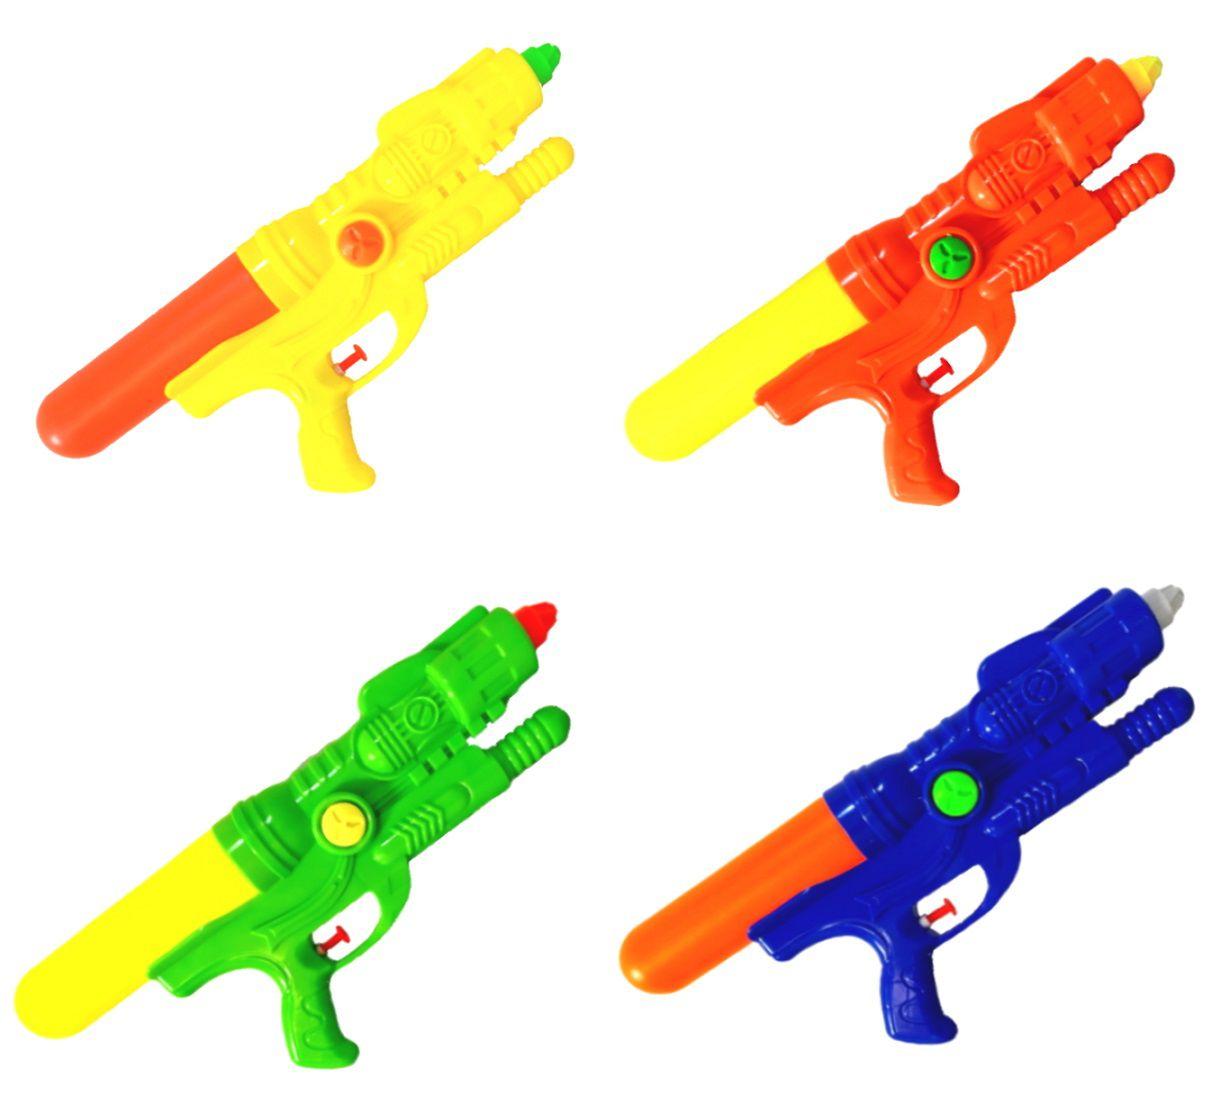 Super Arminha de Água Pistola Lançador de Agua Jato Duplo Flix Water - Kit com 4